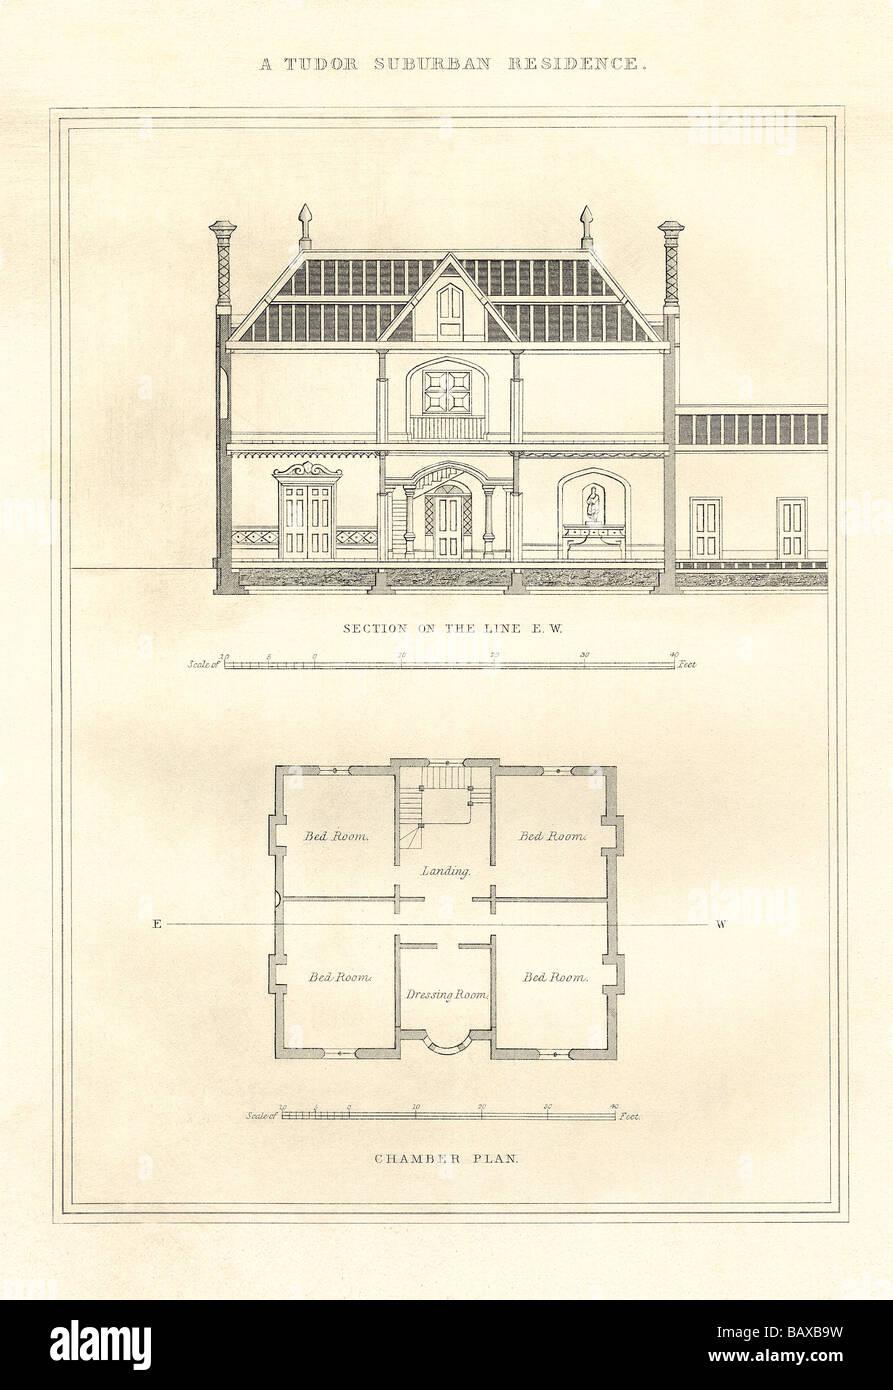 A Tudor Suburban Residence #2 - Stock Image